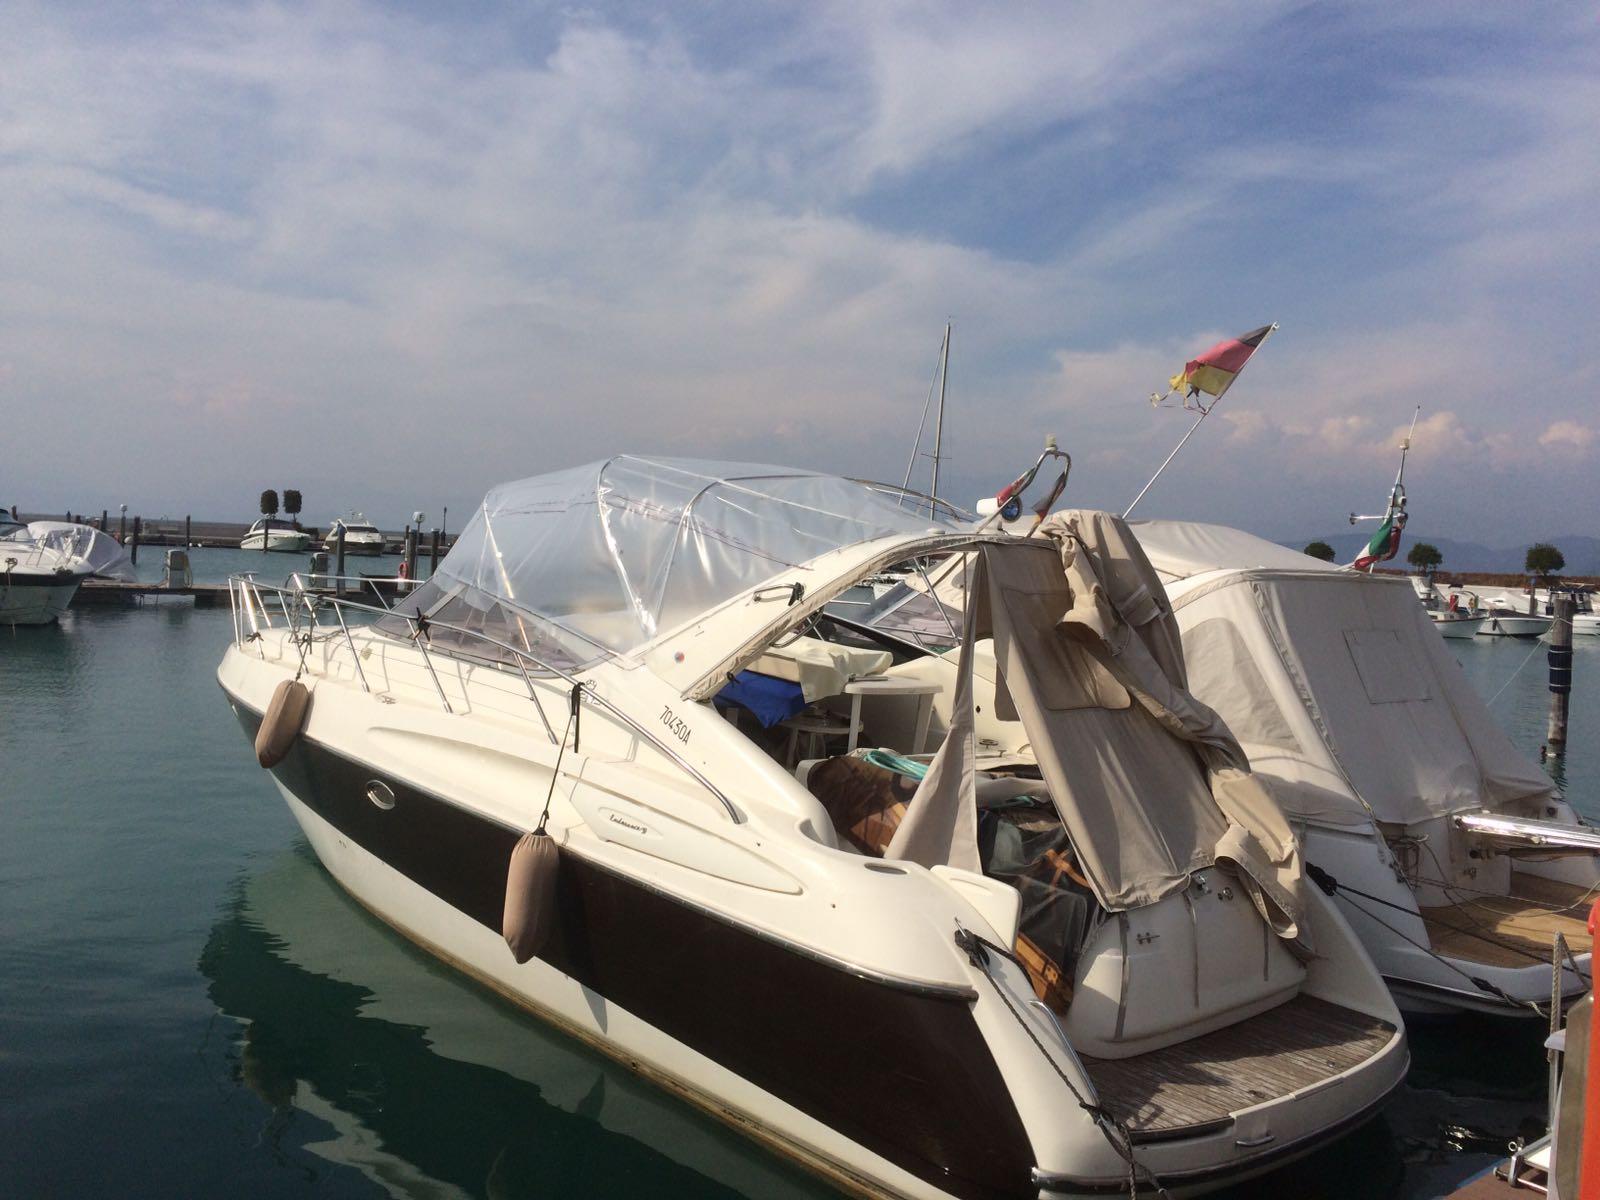 Rifacimento Interni Nautica